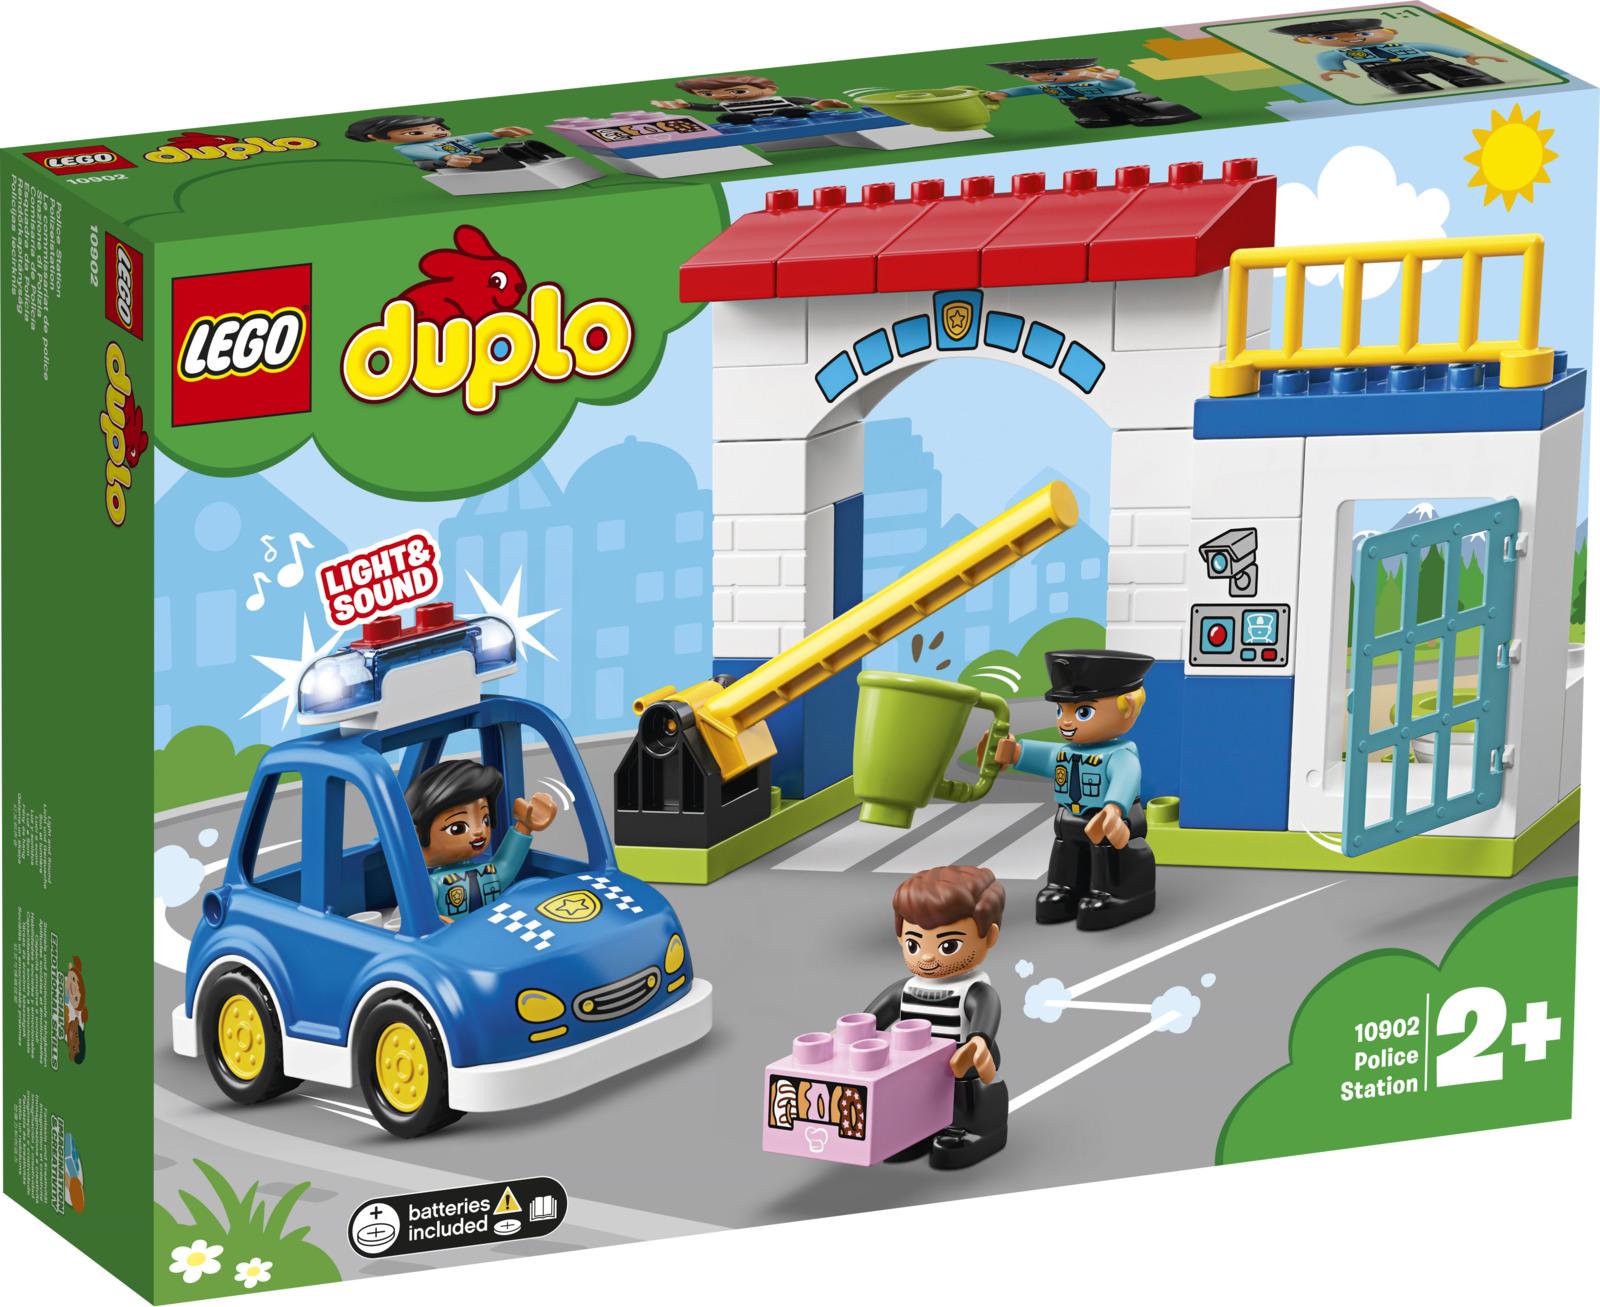 LEGO DUPLO Town 10902 Полицейский участок Конструктор lego education preschool 45011 люди мира duplo